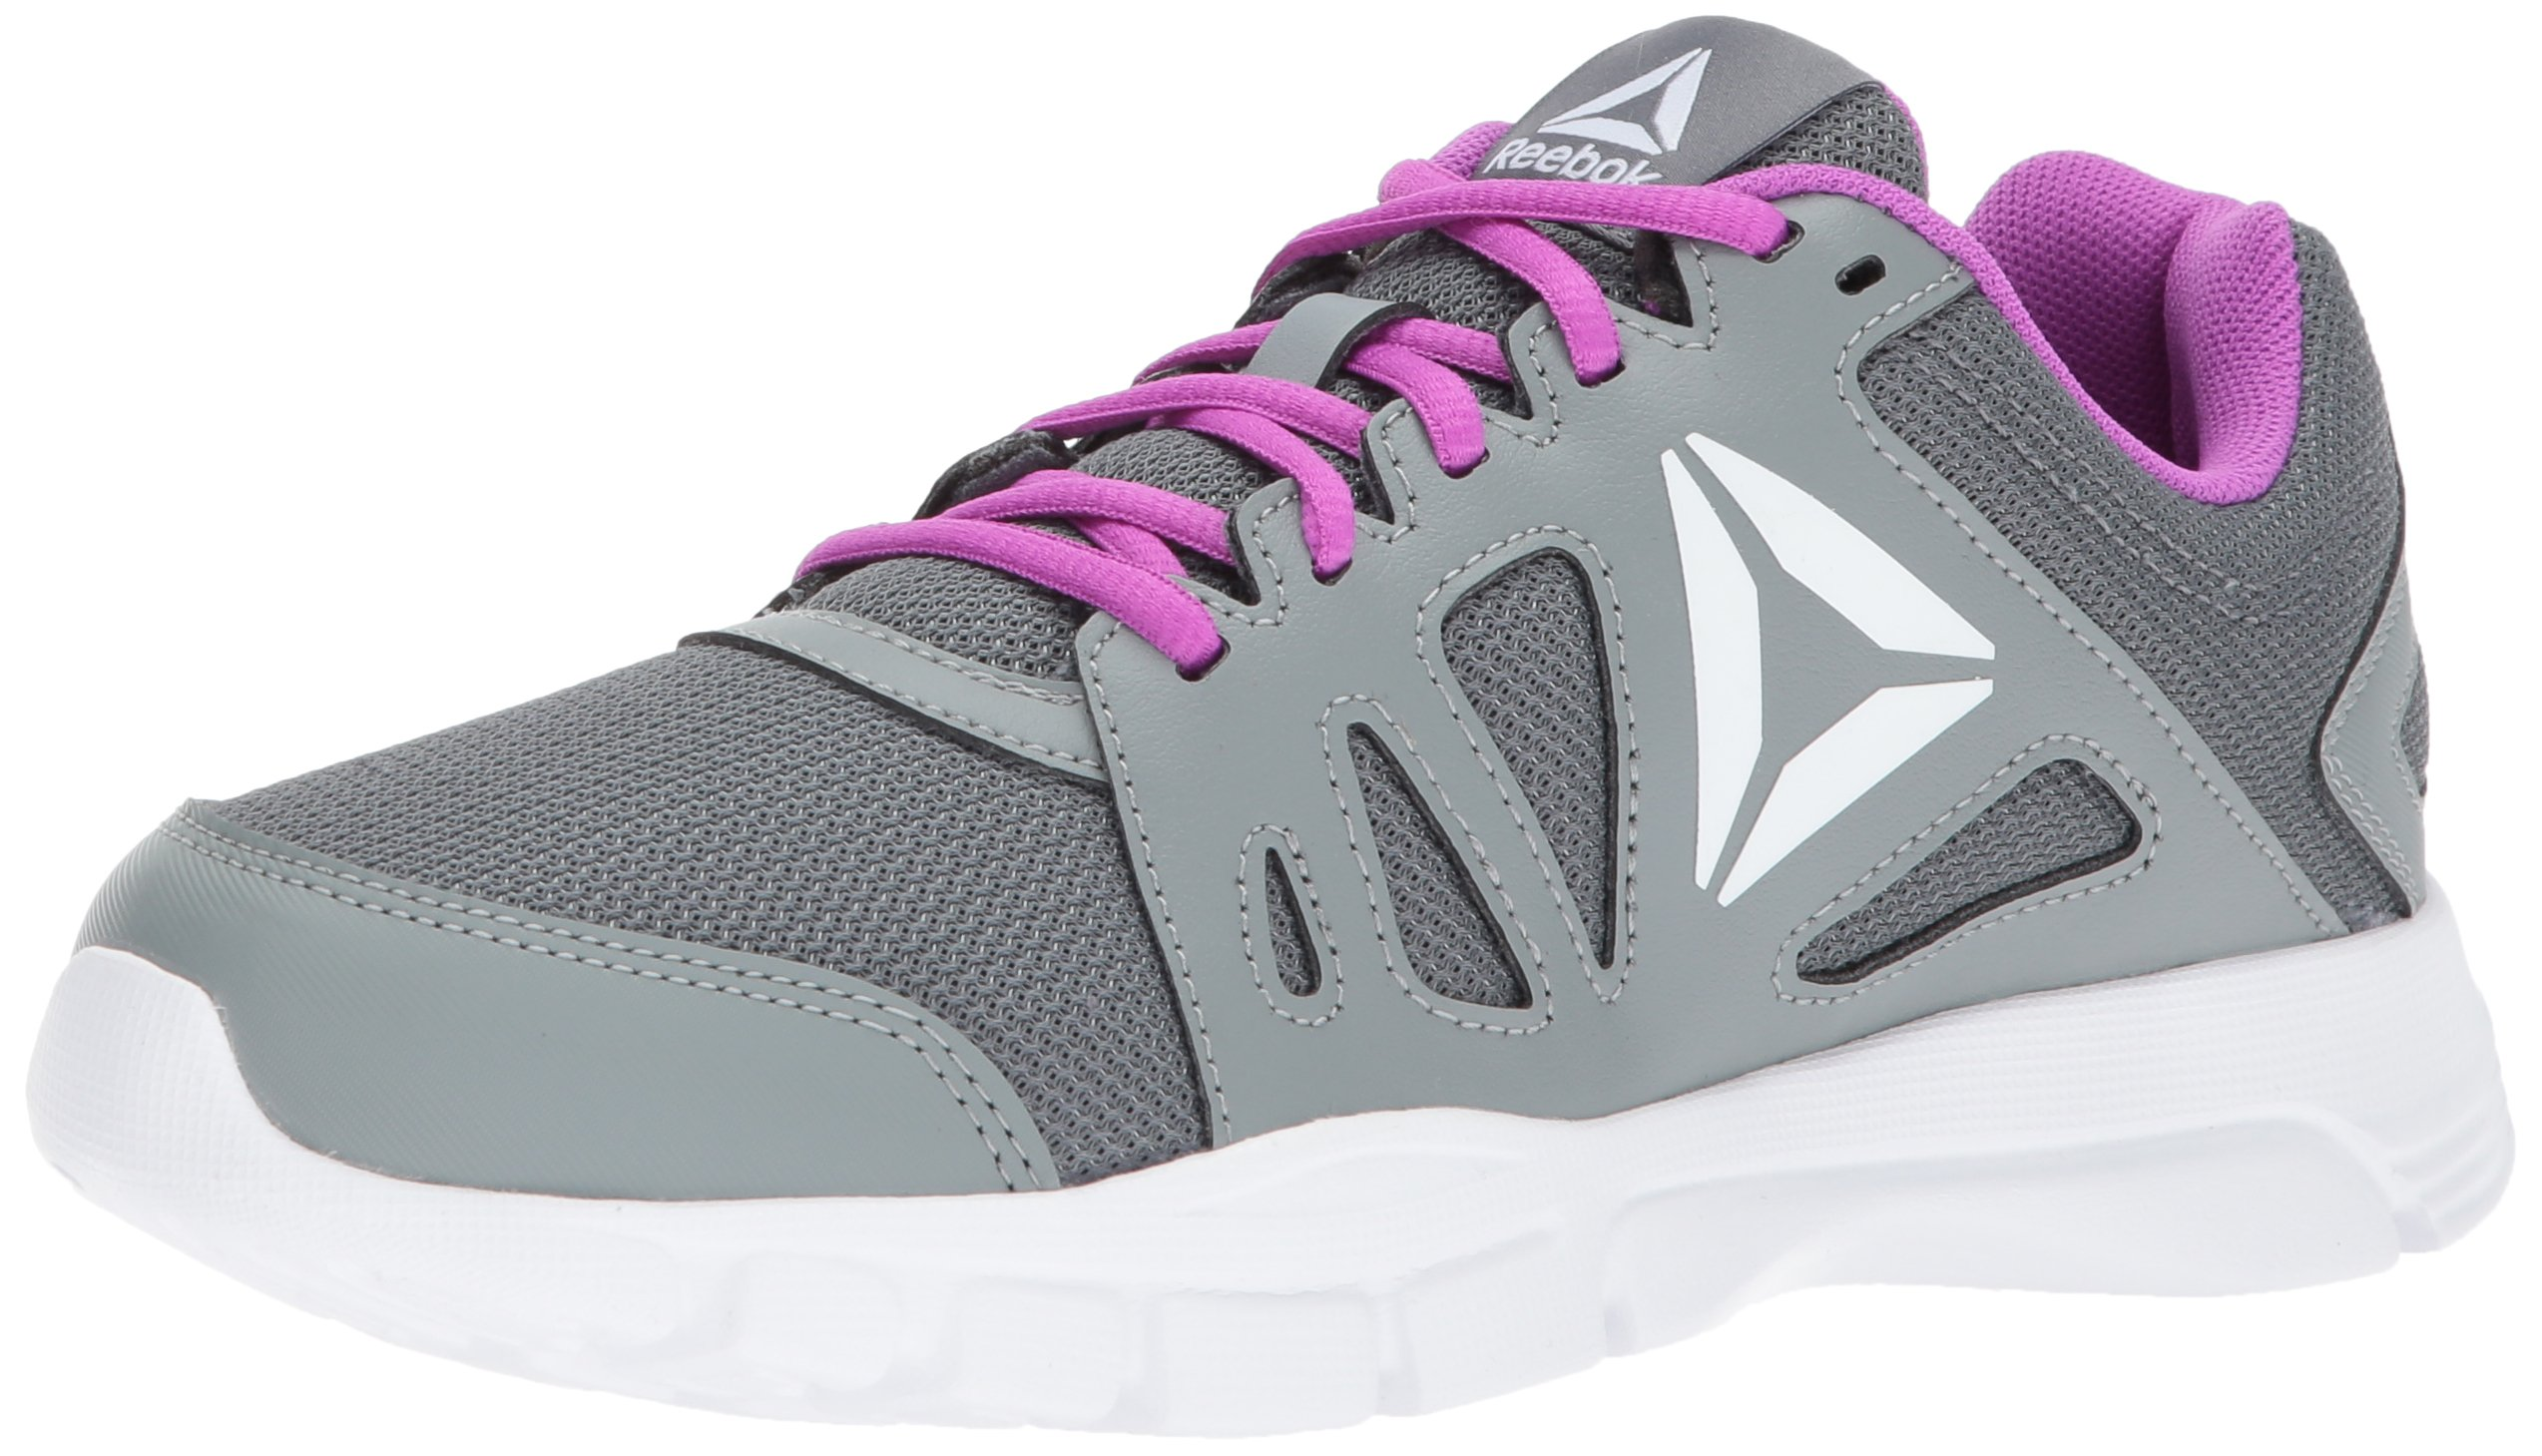 Reebok Women's Trainfusion Nine 2.0 Track Shoe, Alloy/Flint Grey/Vicious Violet/White, 8 M US